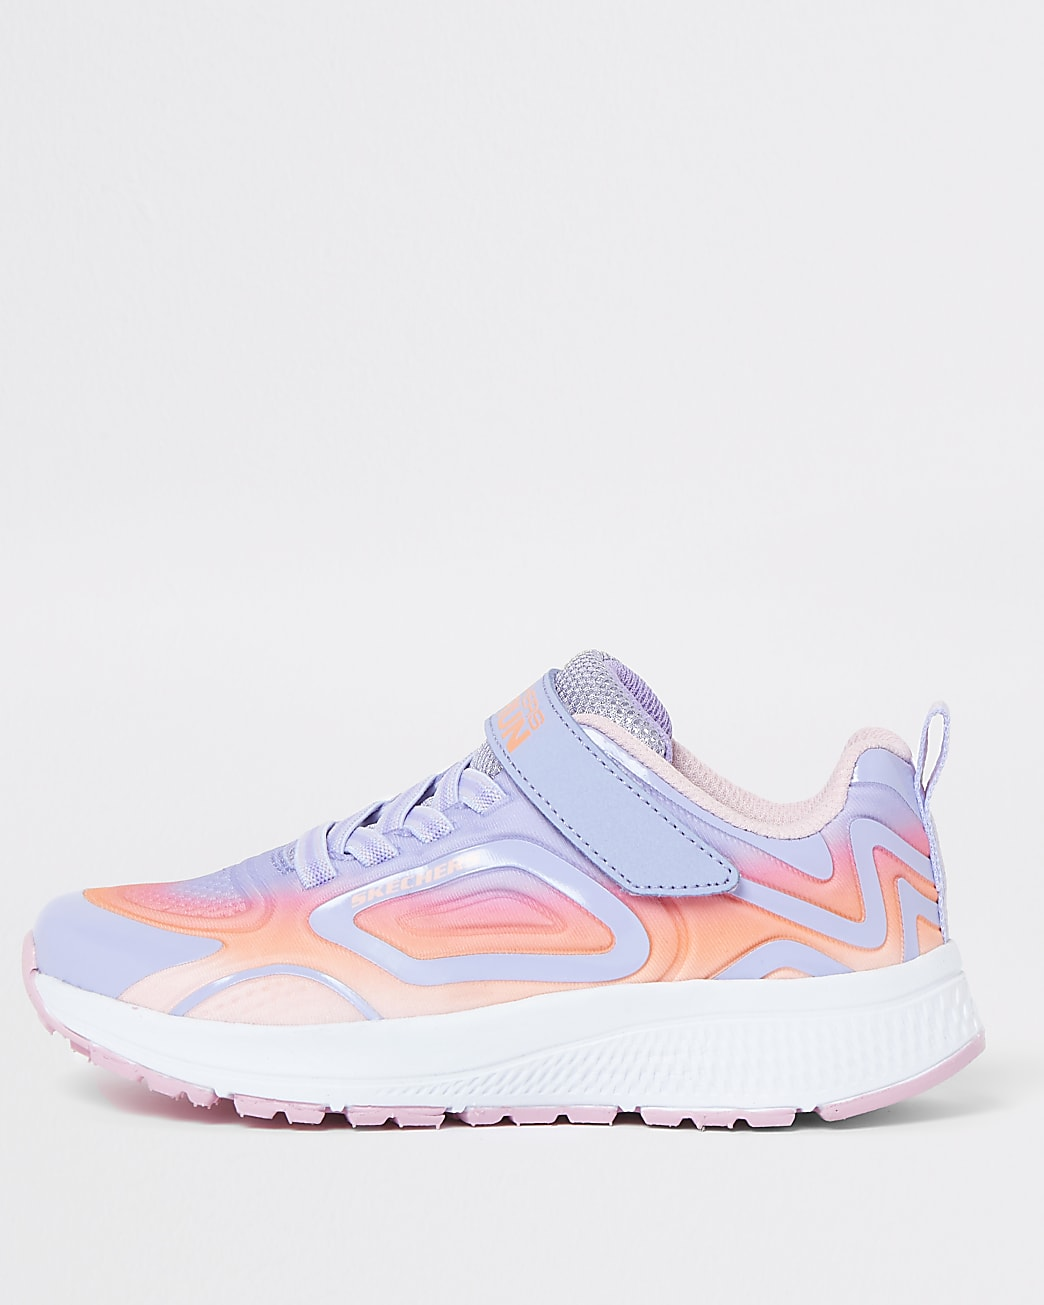 Girls Skechers pink trainers